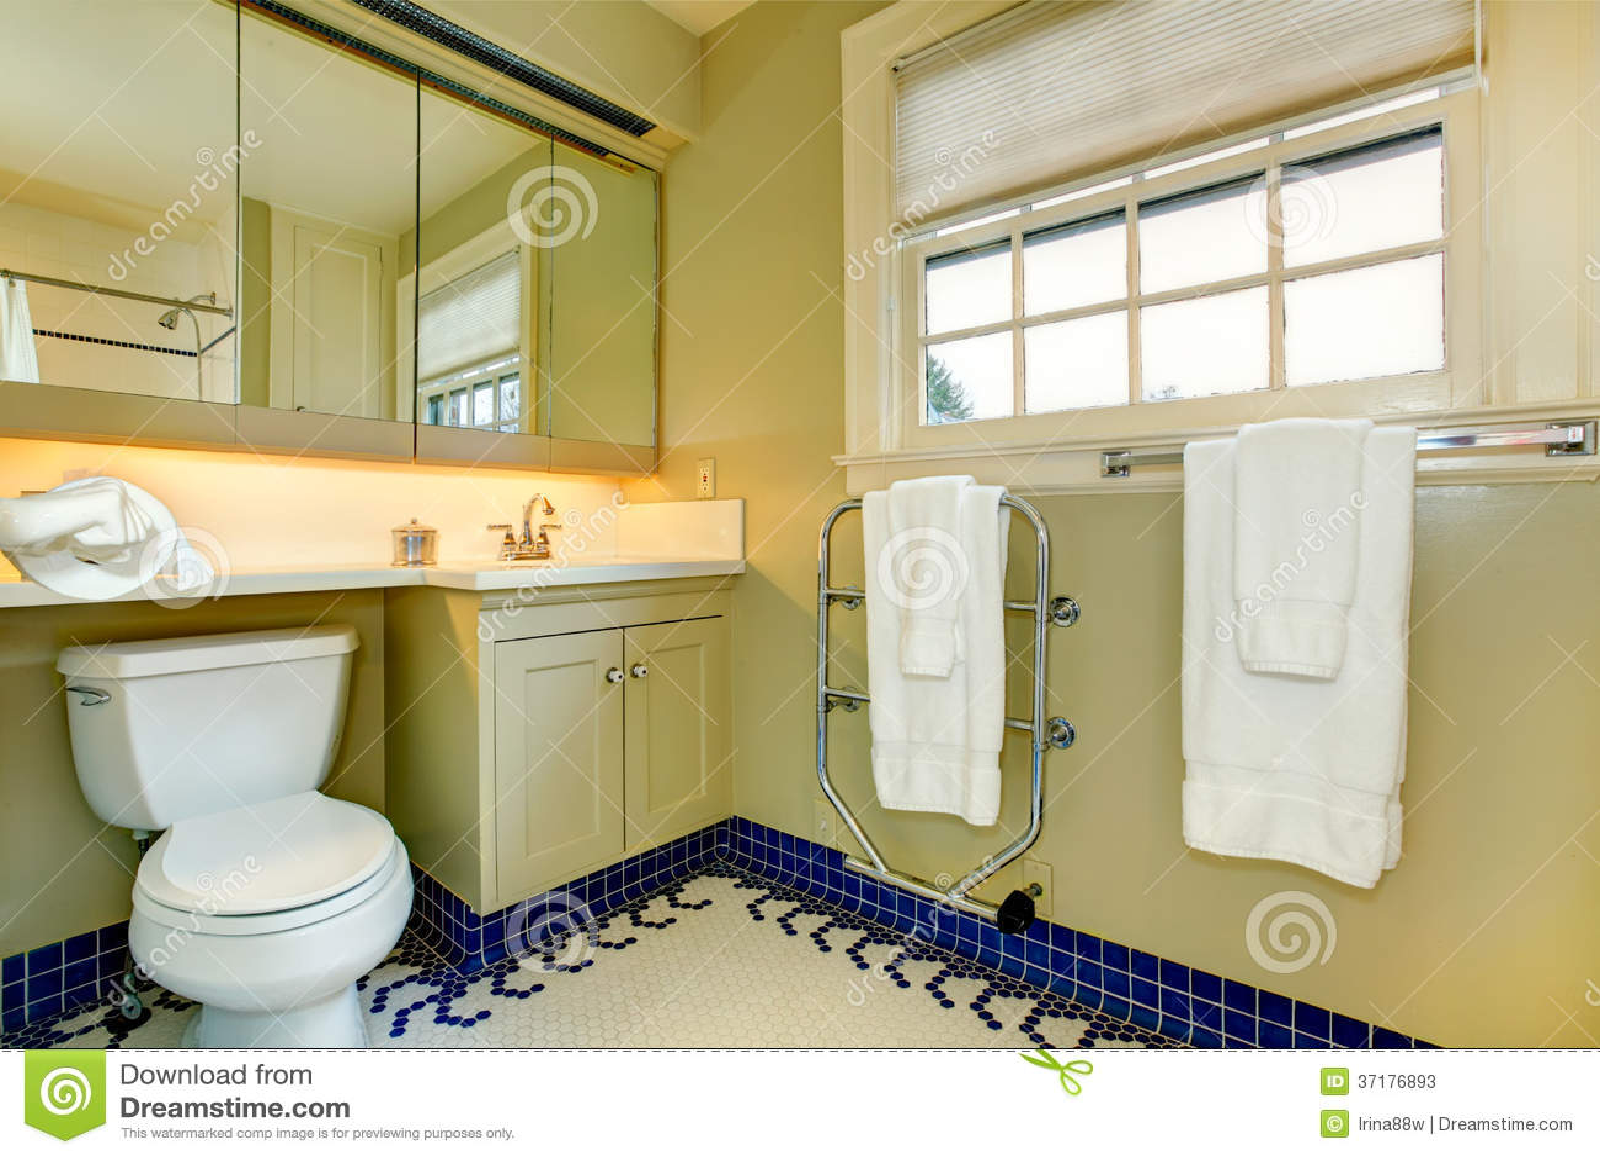 Blue And Black Bathroom Decor